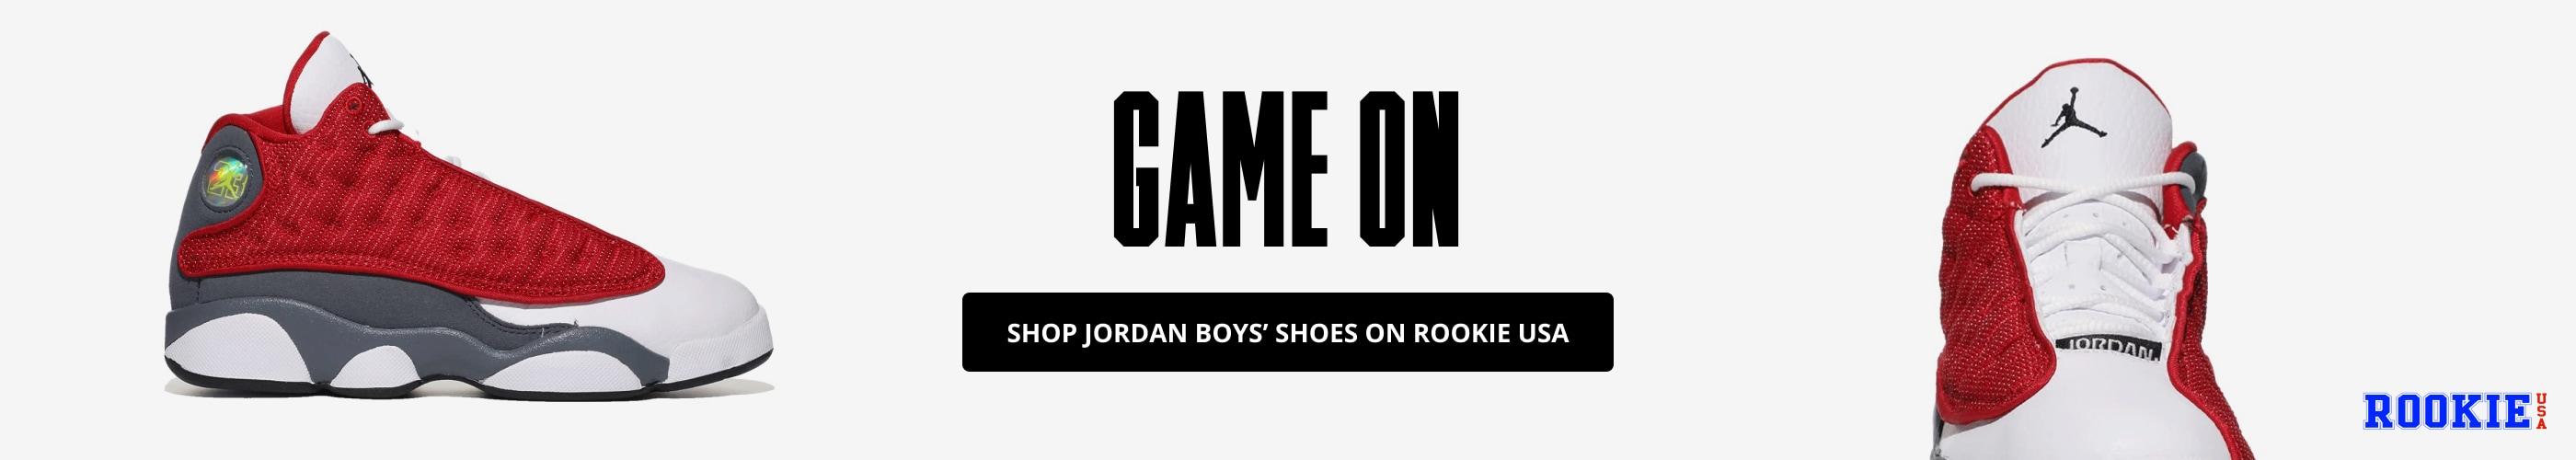 Shop Jordan Boys' Shoes on Rookie USA